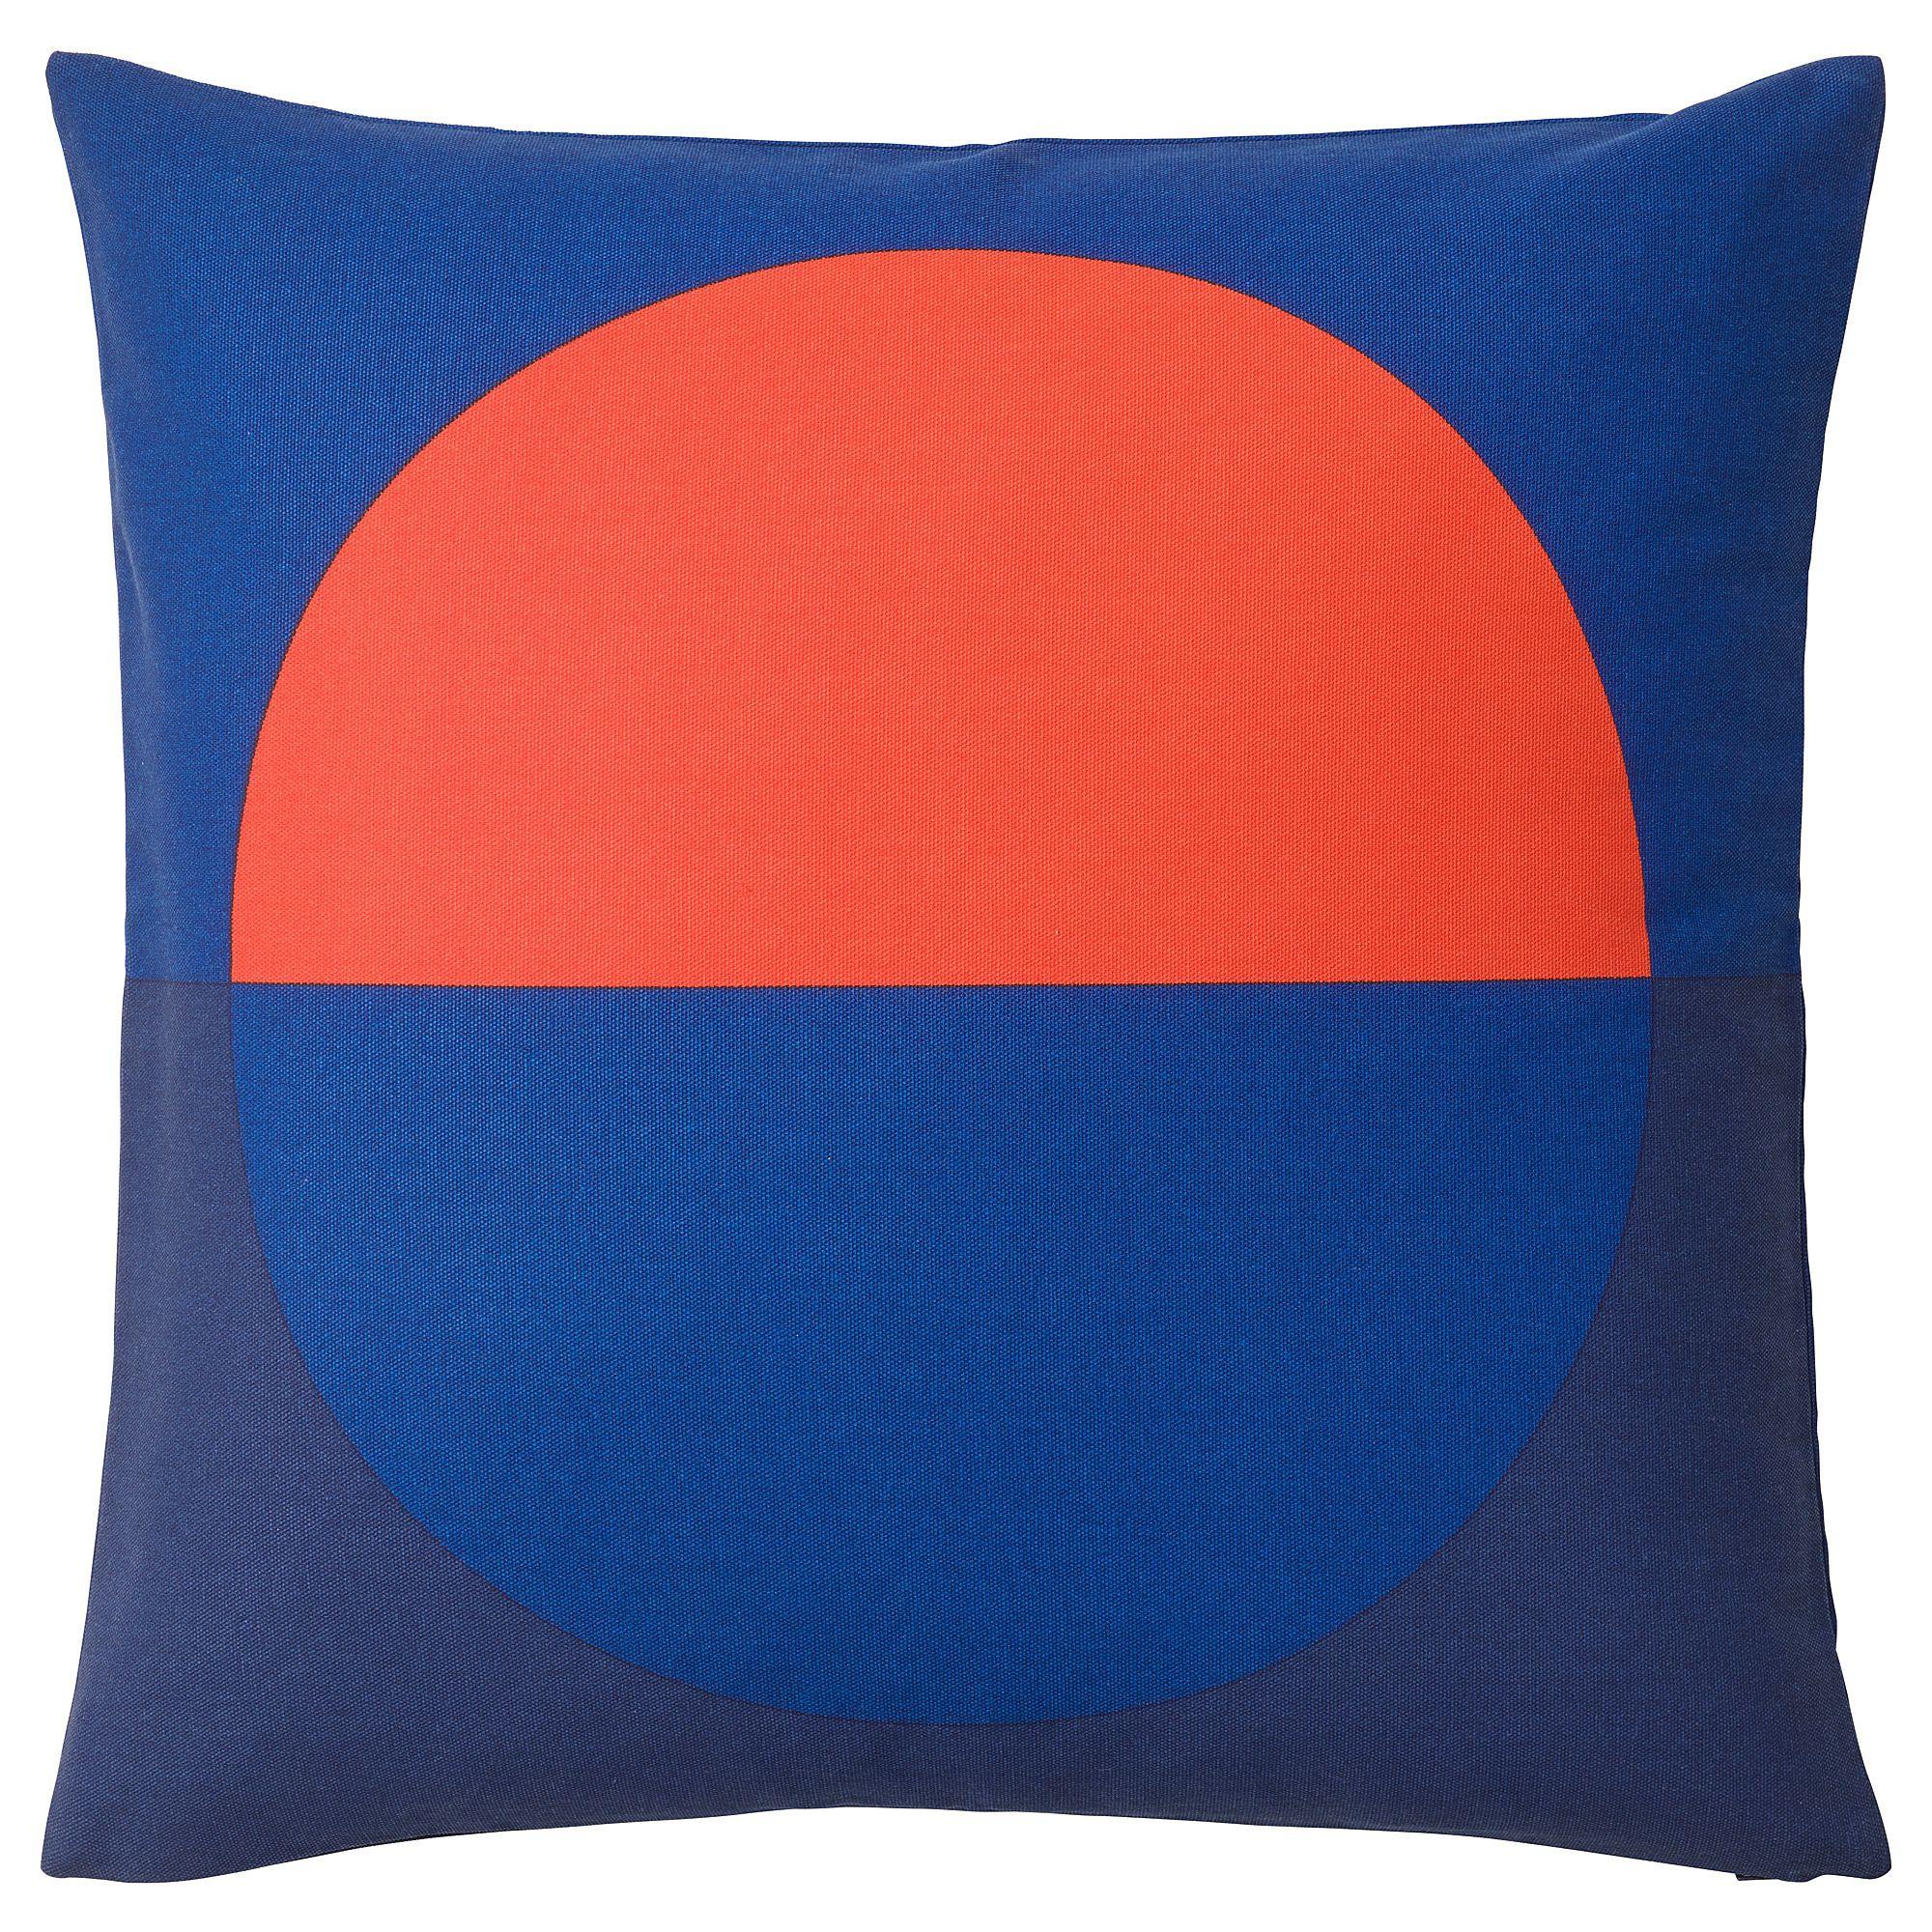 Majalotta Cushion Cover